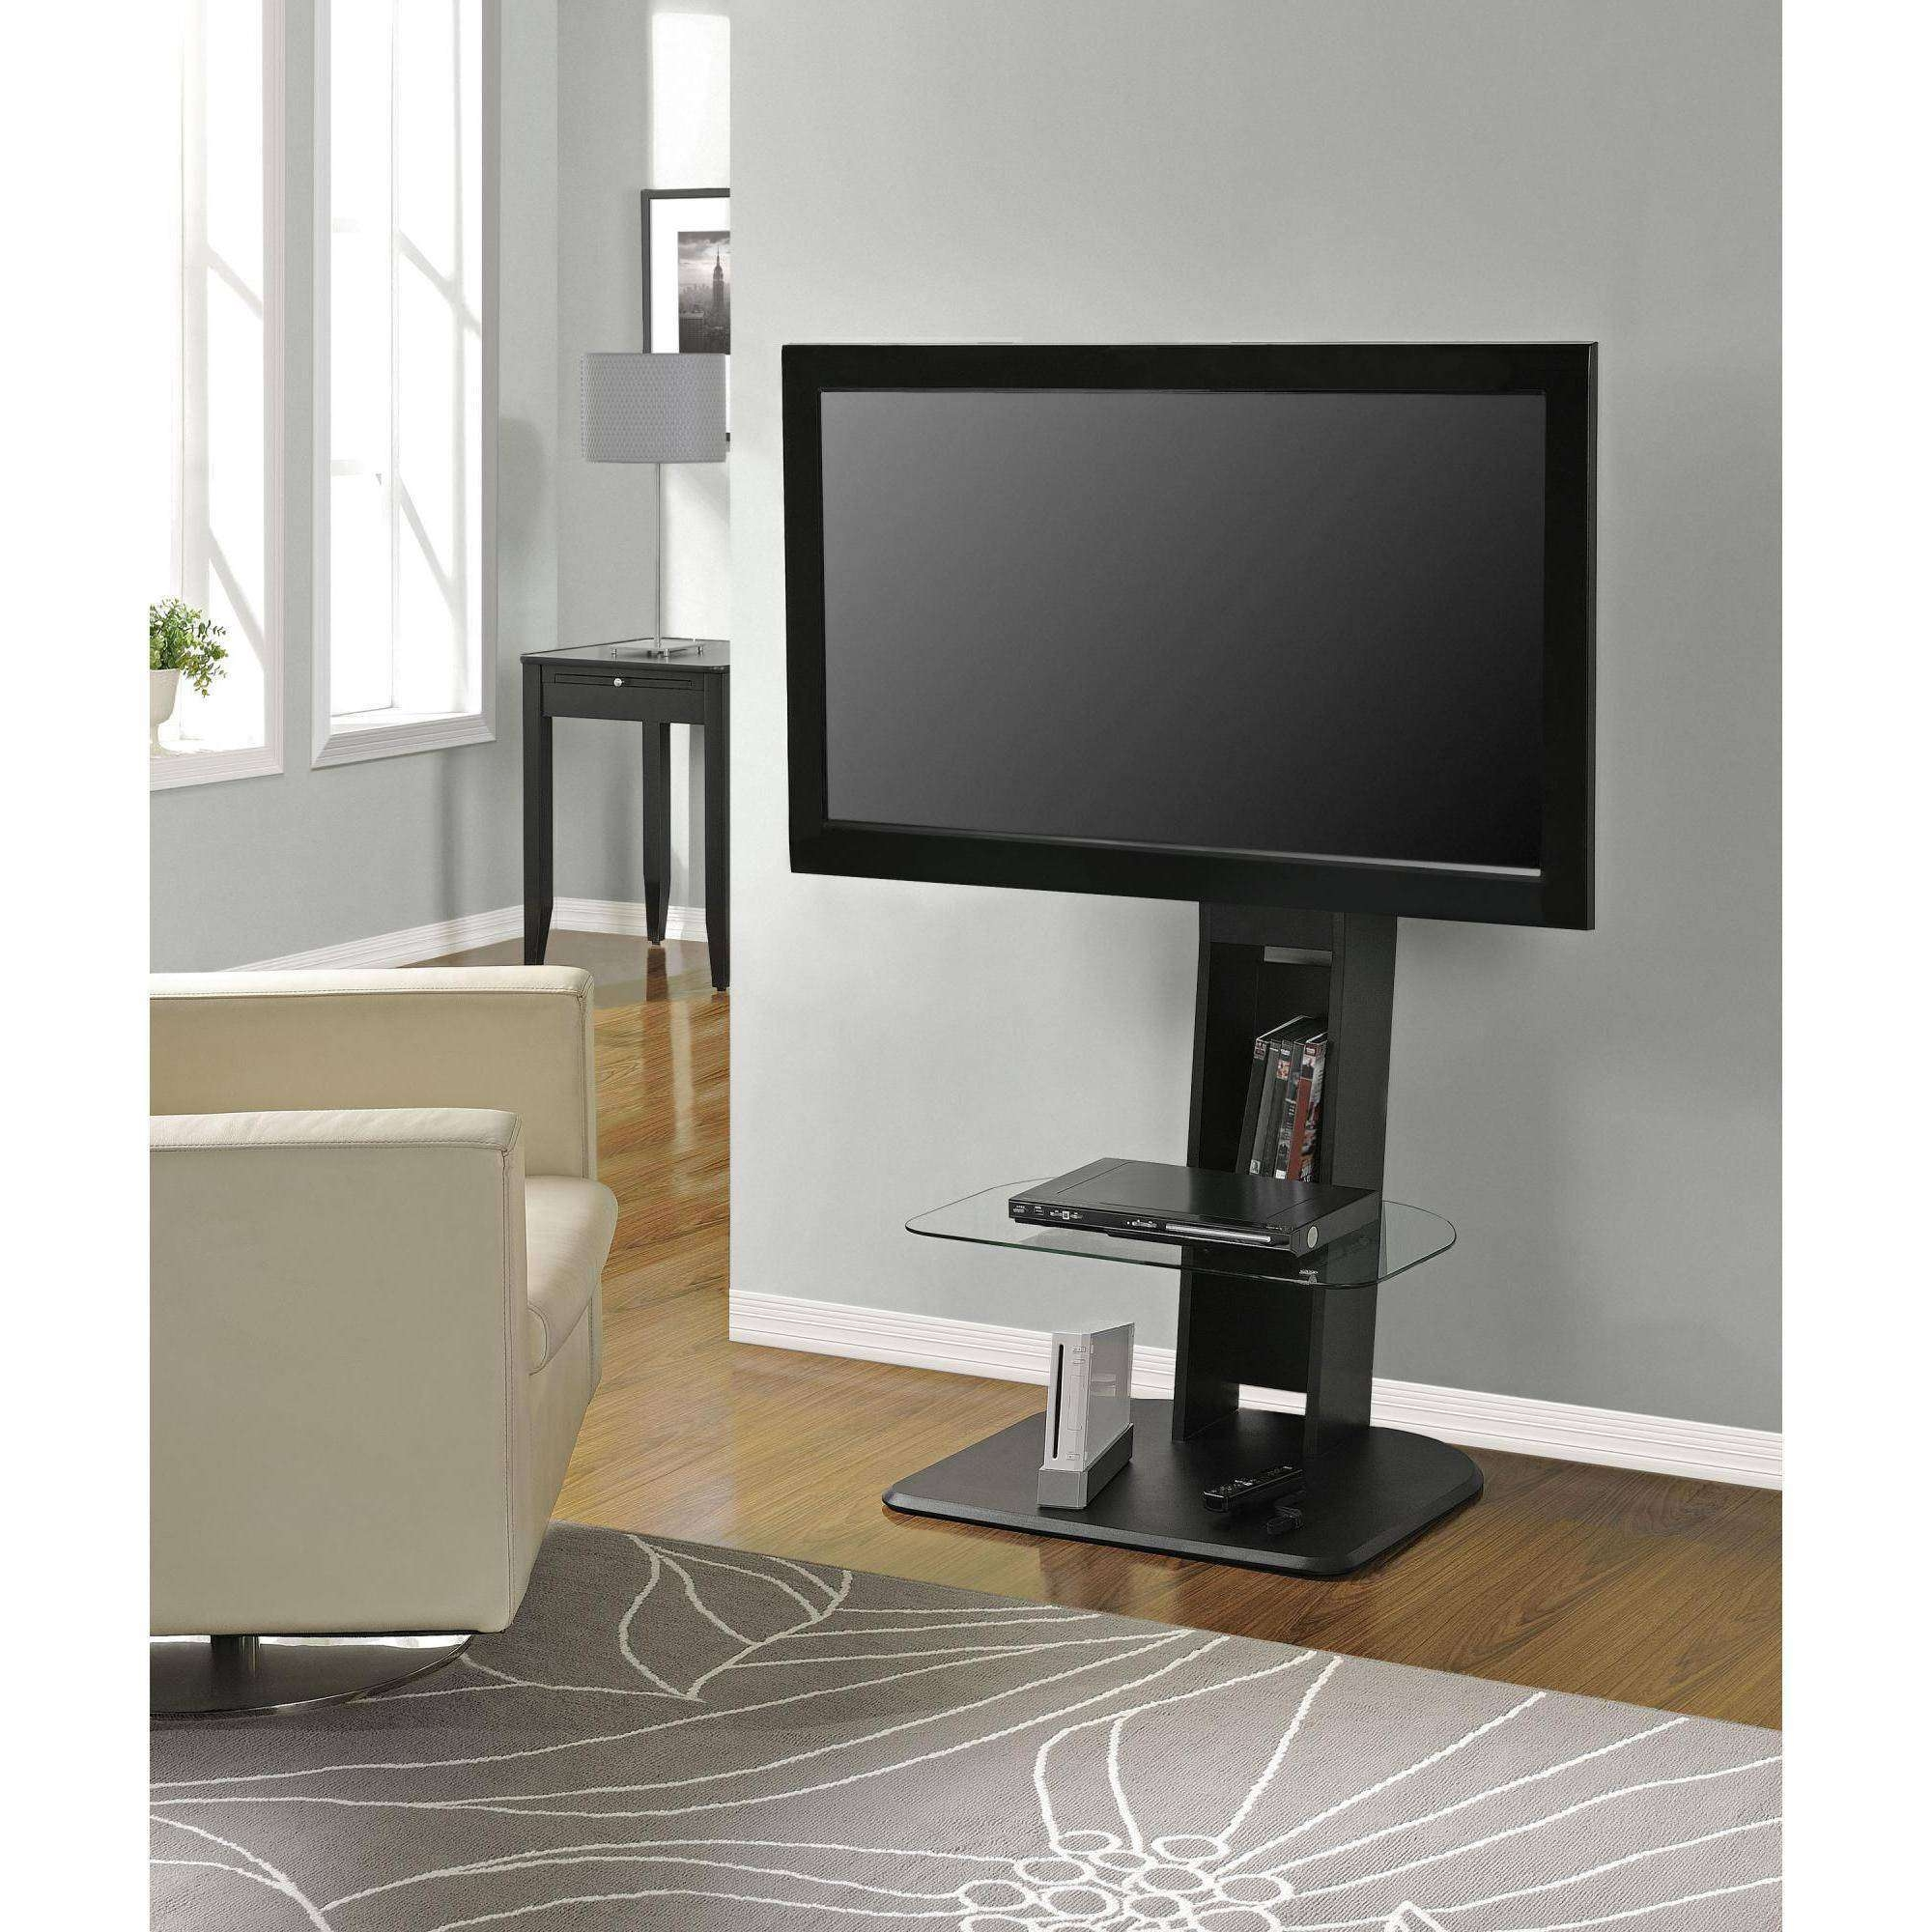 "Jaxx Black/grey Corner Tv Stand For Tvs Up To 40"" – Walmart With Regard To Slimline Tv Stands (View 6 of 15)"